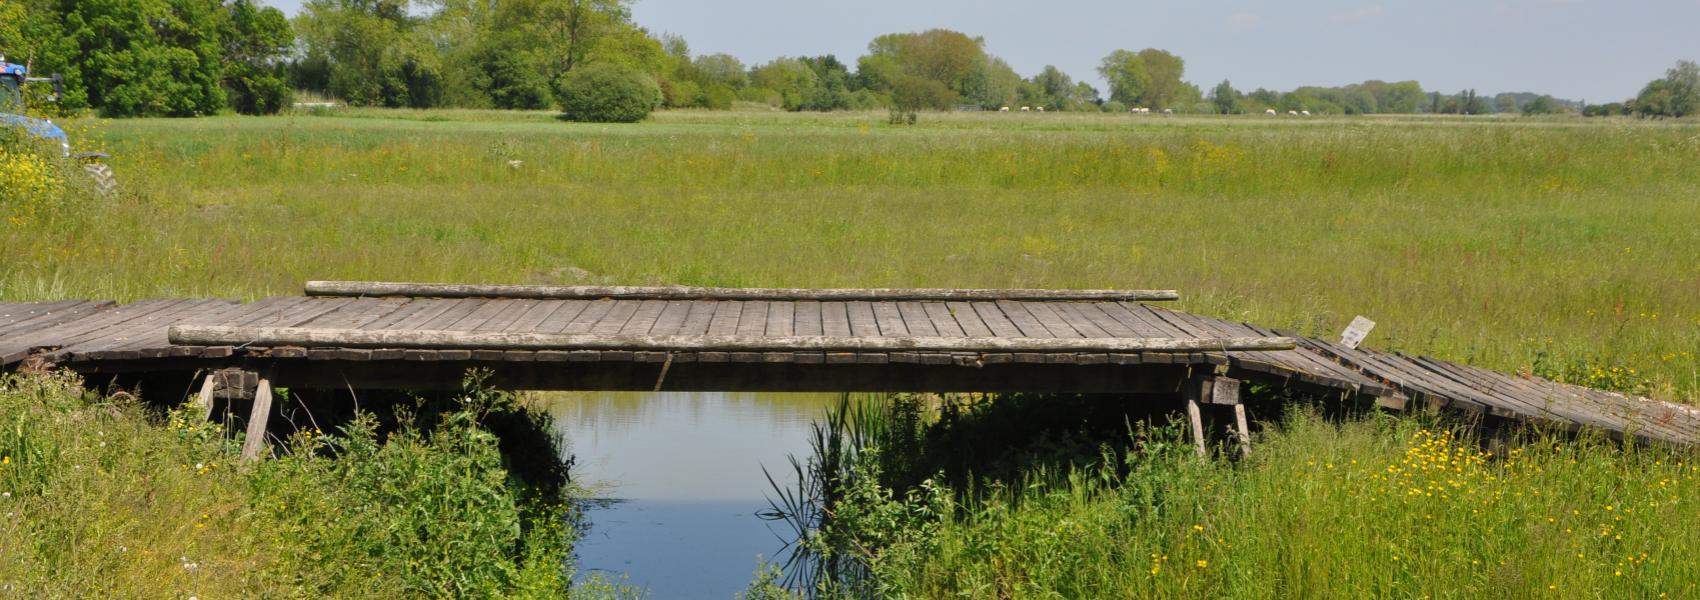 de hooipiete (oude brug)